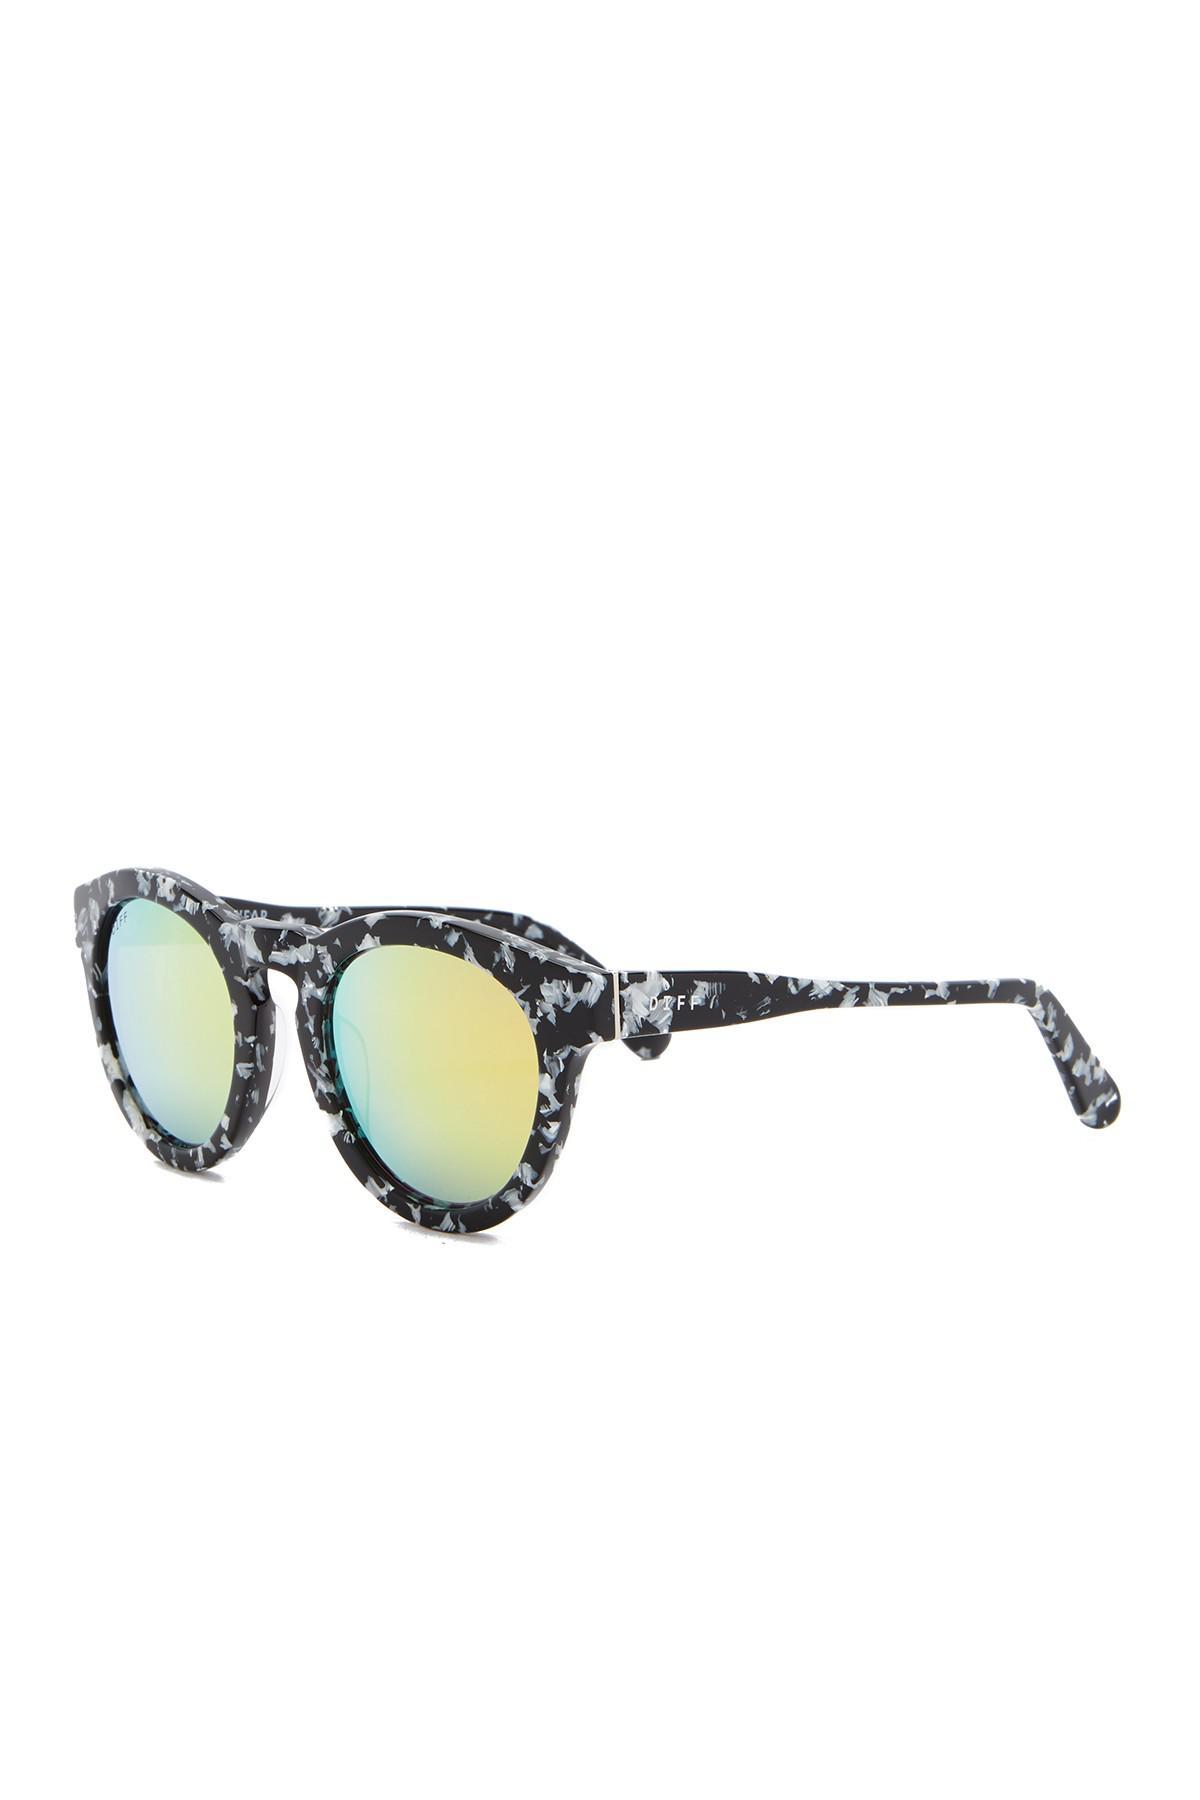 bb8fda1768 DIFF - Multicolor Dime Round Keyhole Bride 46mm Acetate Sunglasses - Lyst.  View fullscreen